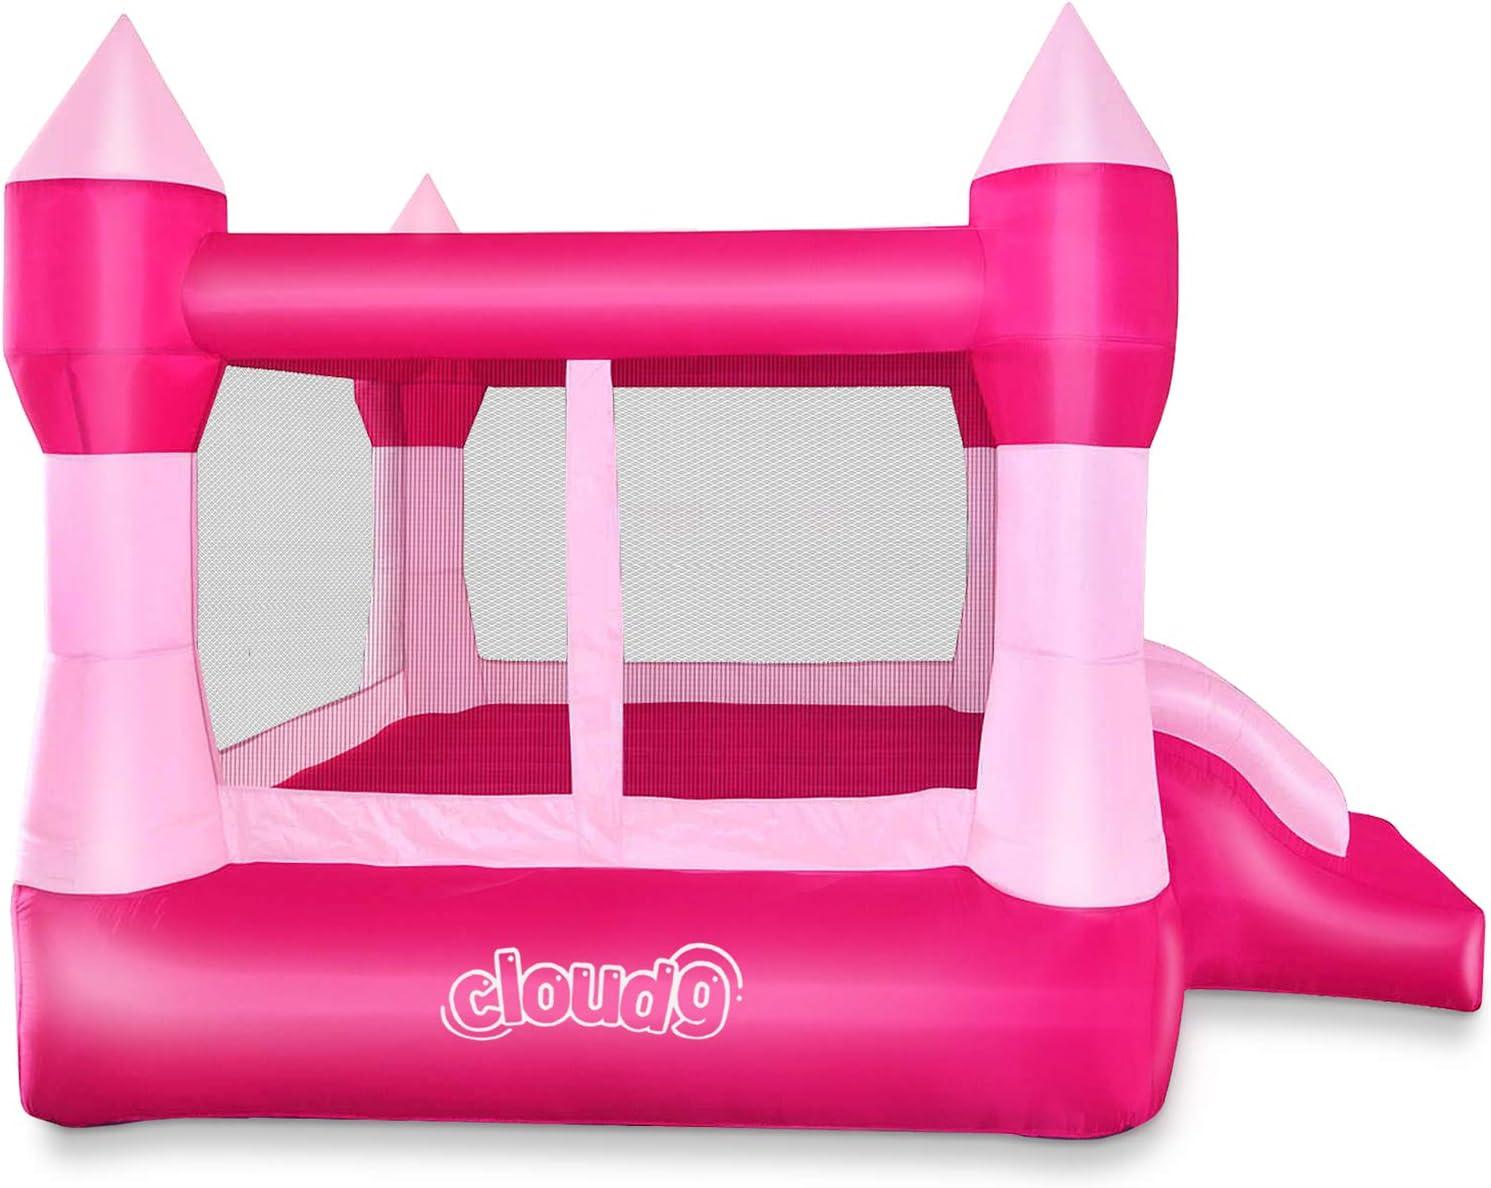 Amazon.com: Casa inflable de princesa Cloud 9, tema de ...